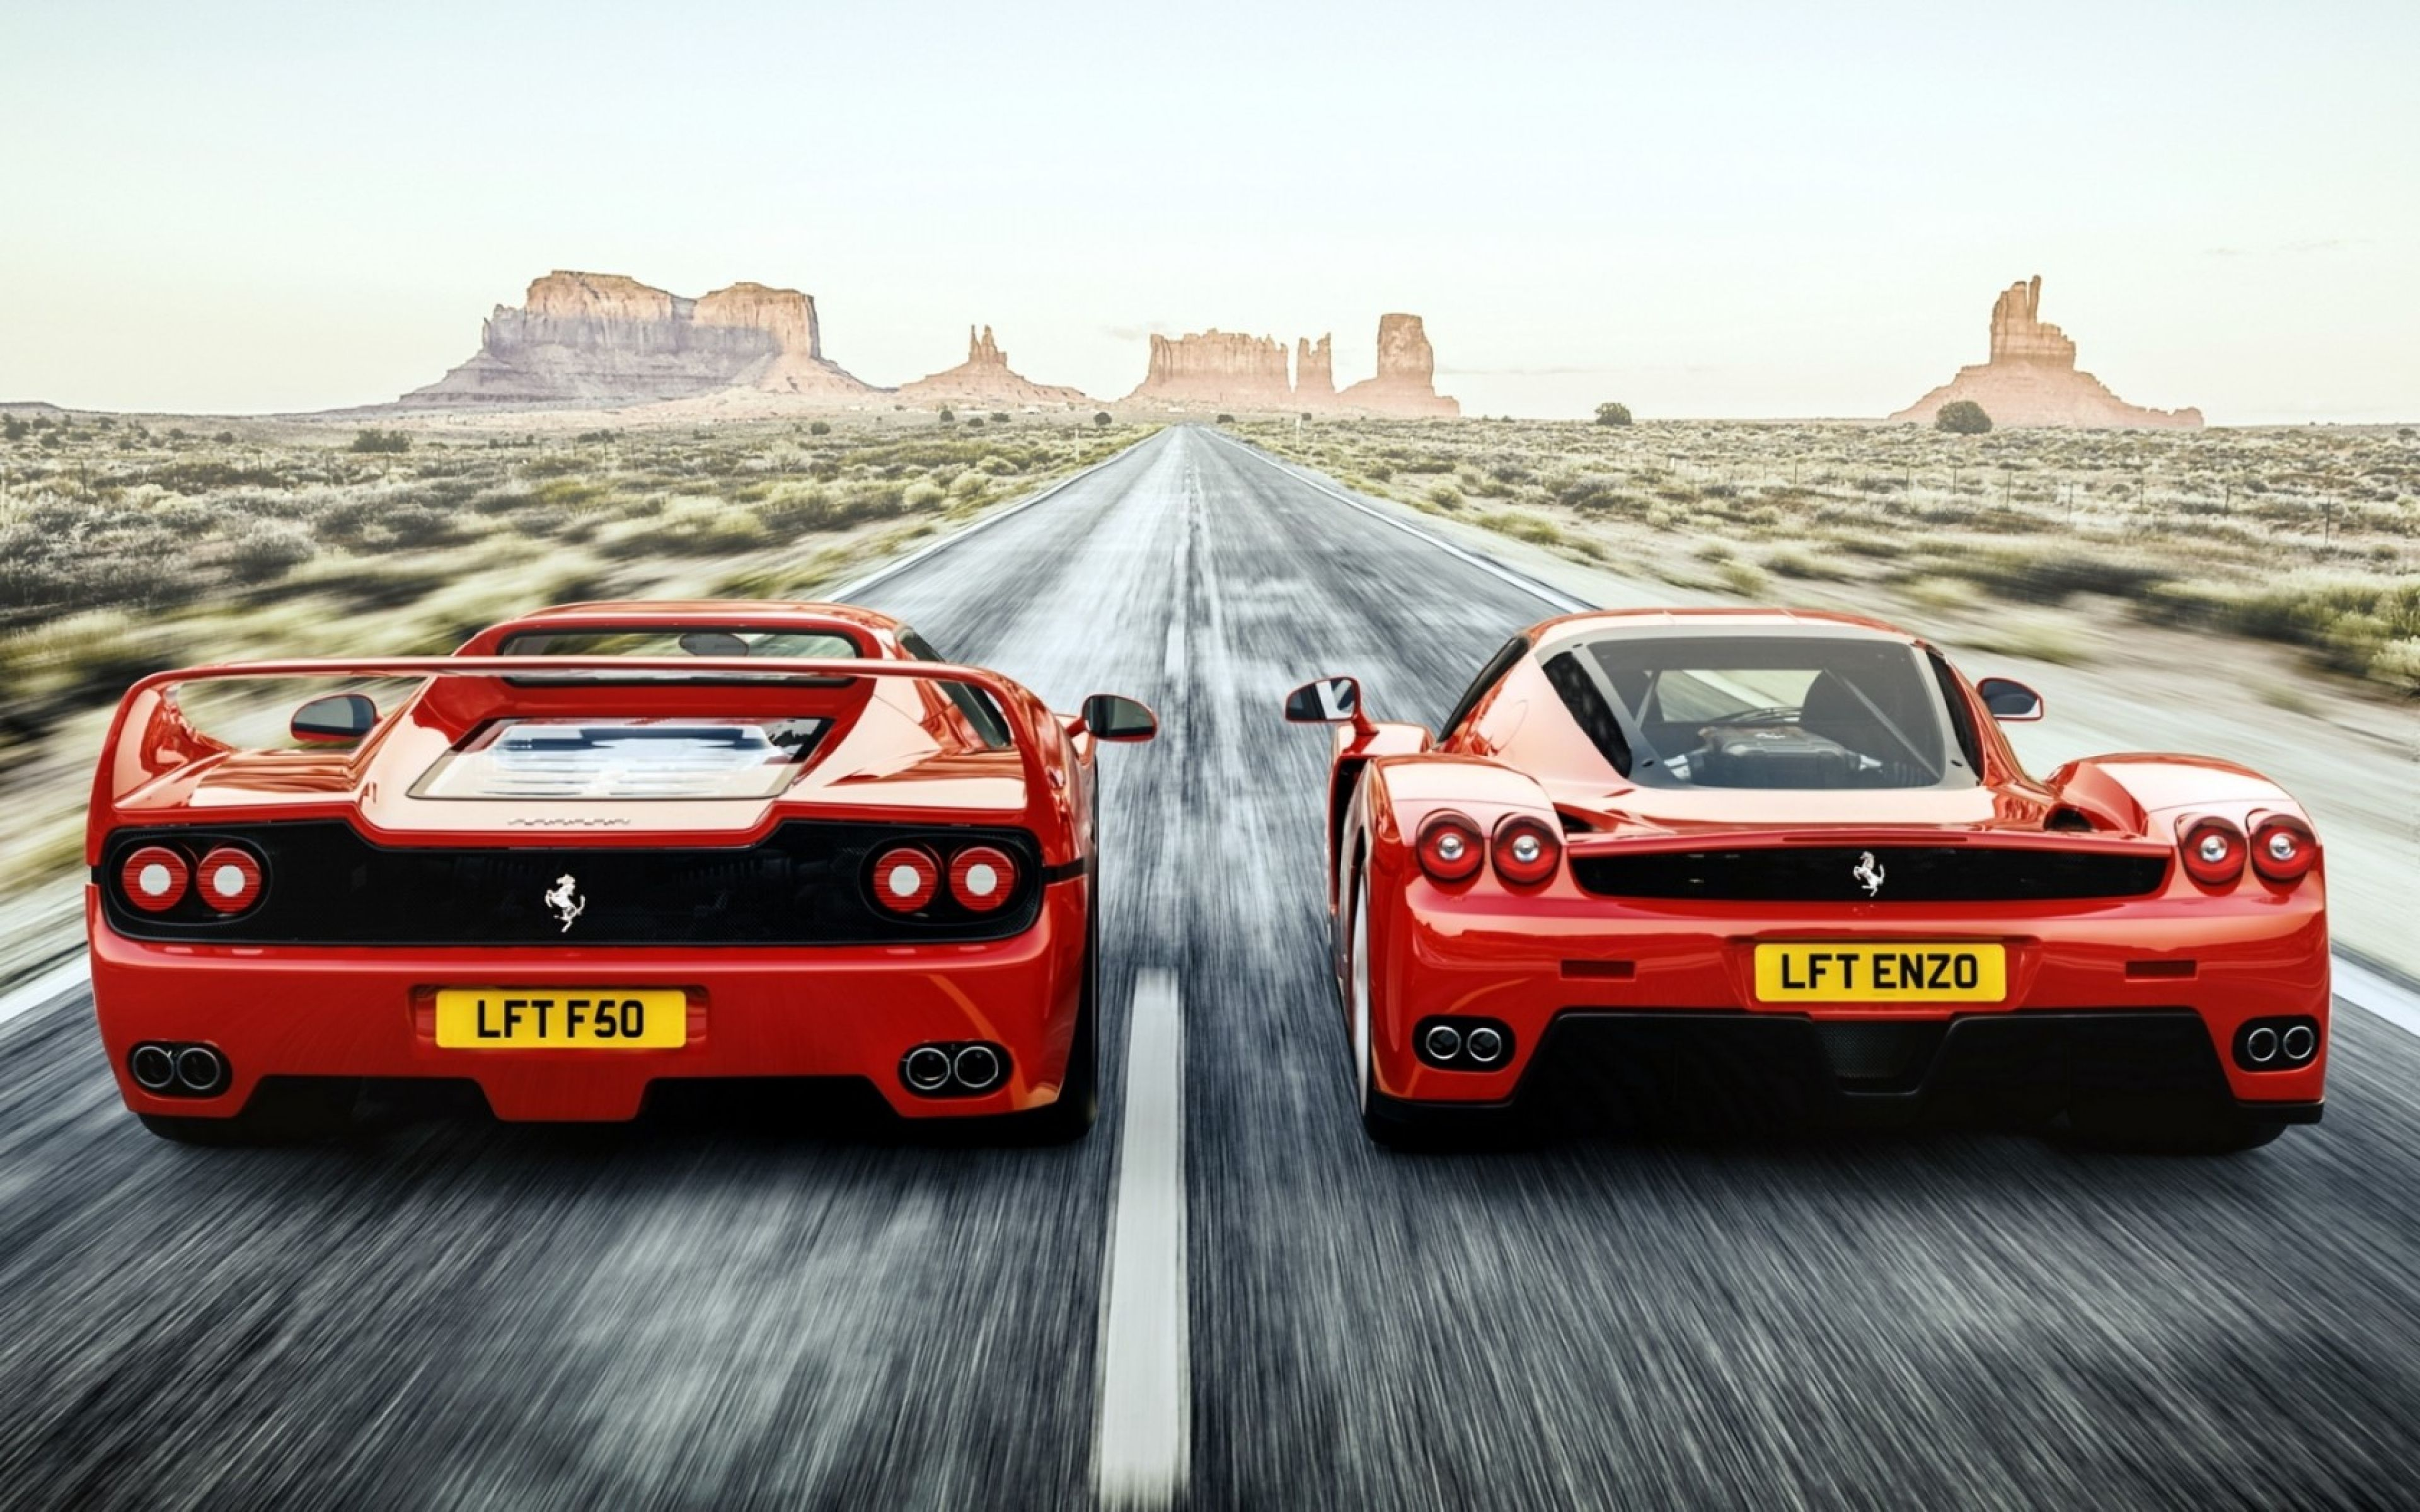 Wallpaper Ferrari Collection For Free Download Rojo Pinterest